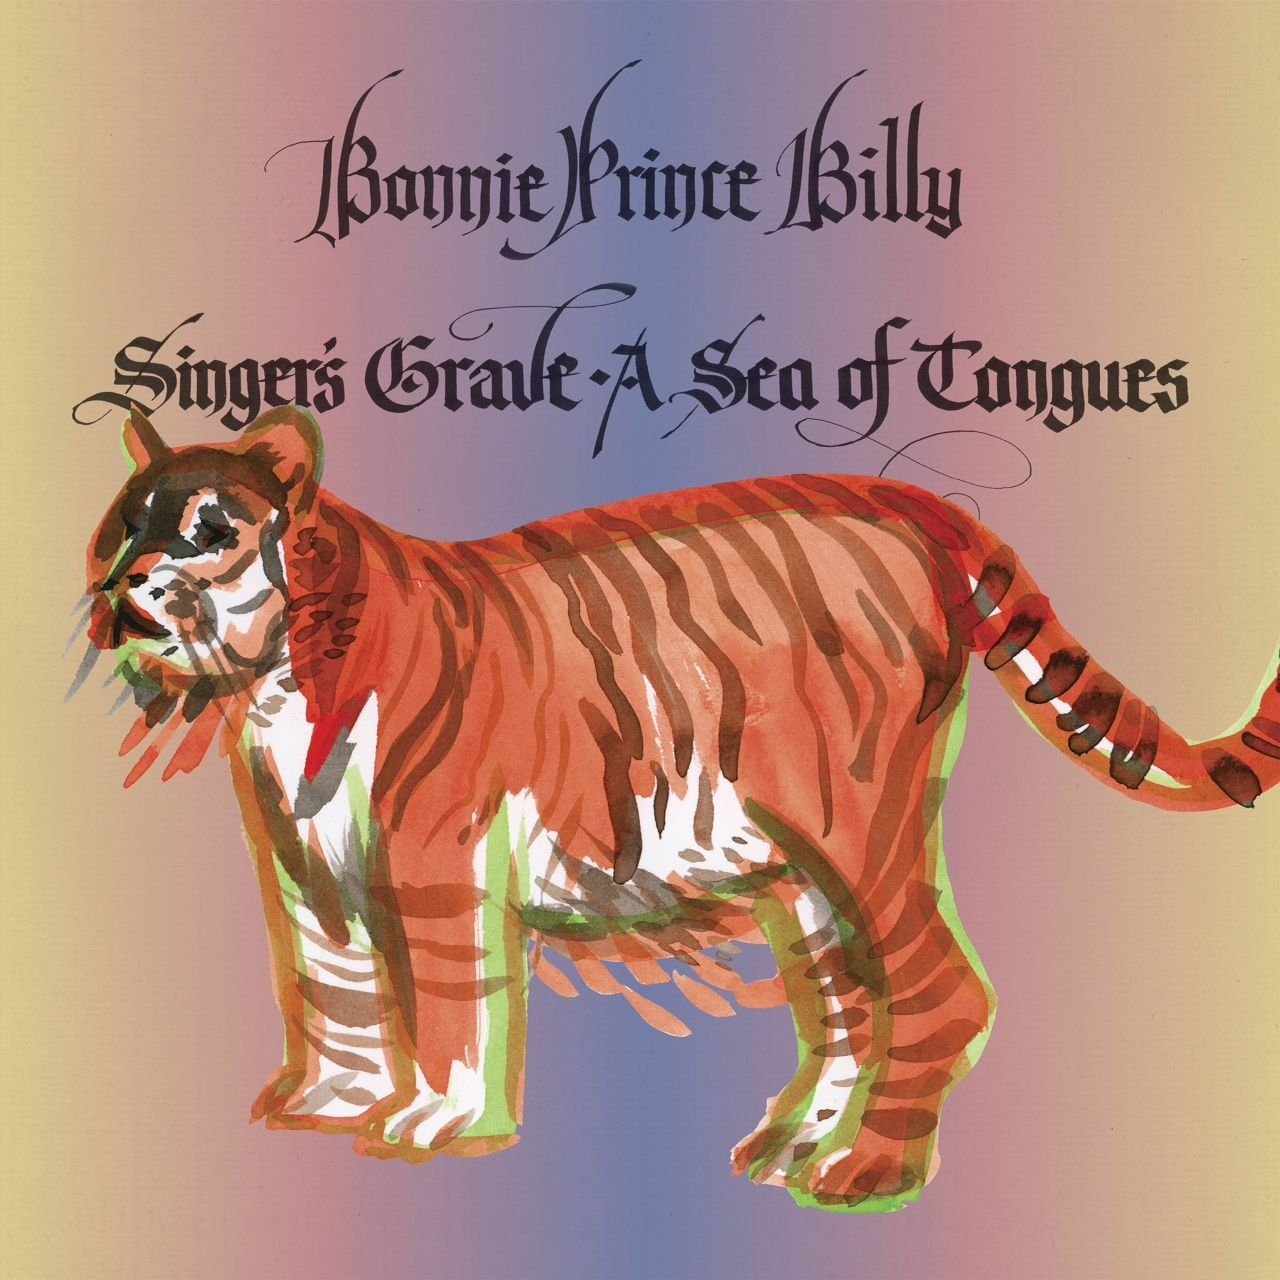 Bonnie Prince Billy - Singer's Grave a